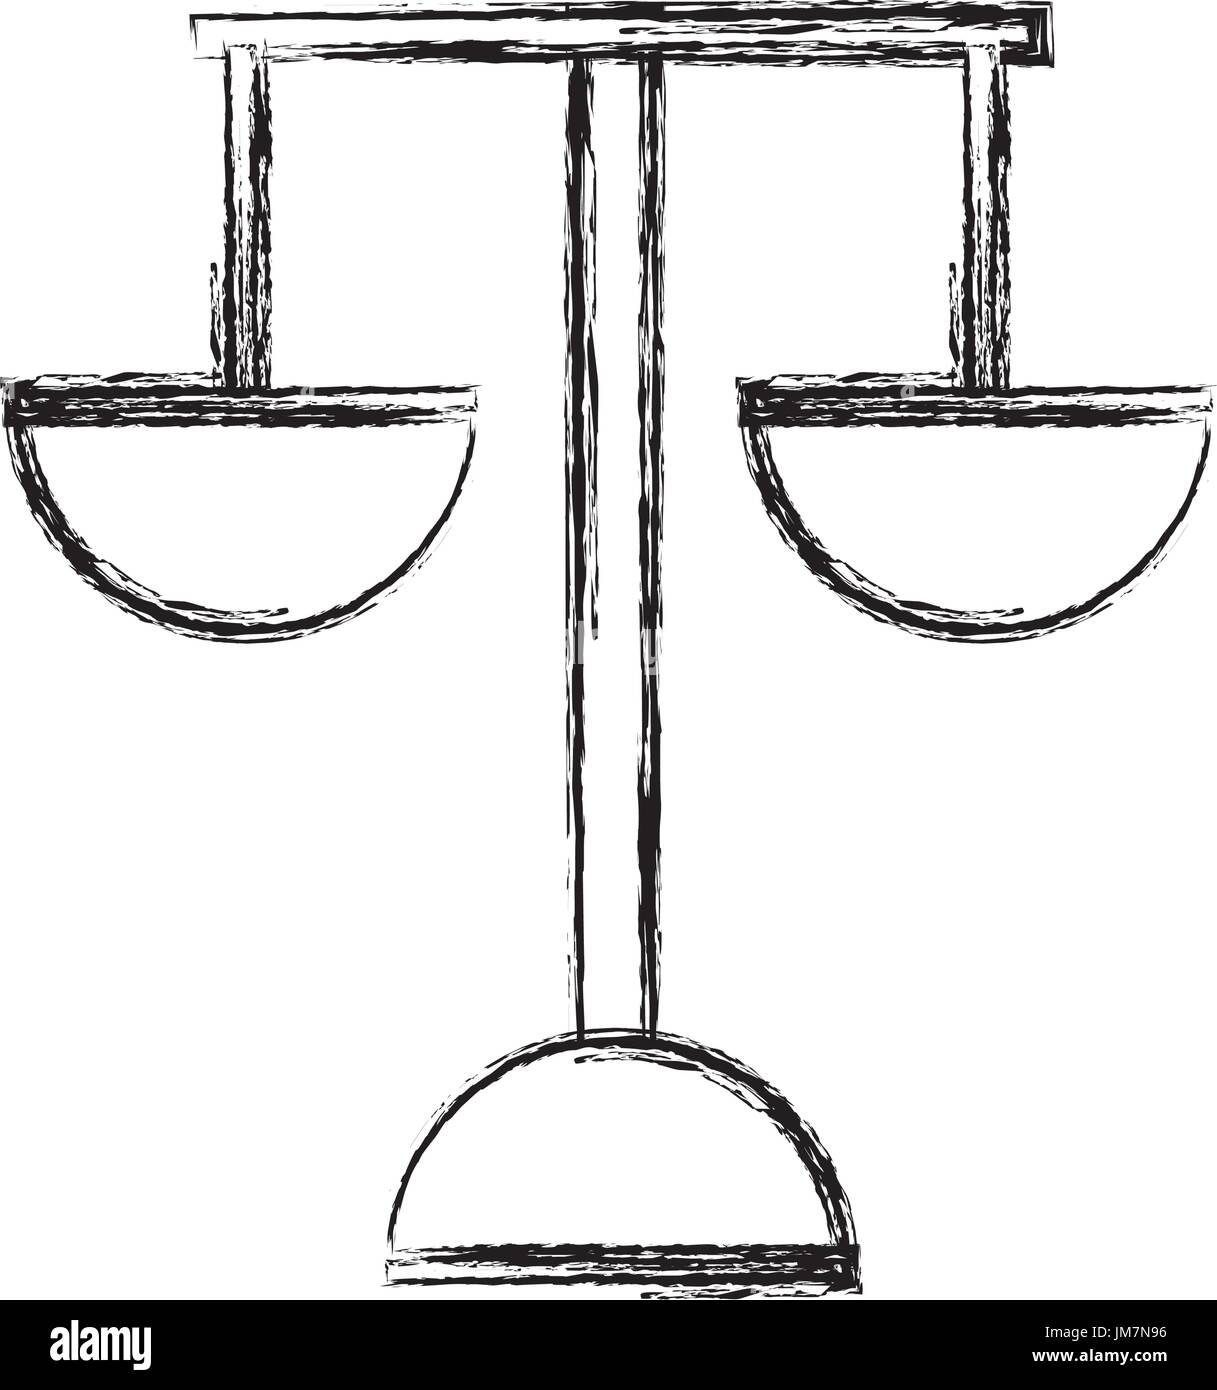 hight resolution of justice balance symbol stock vector